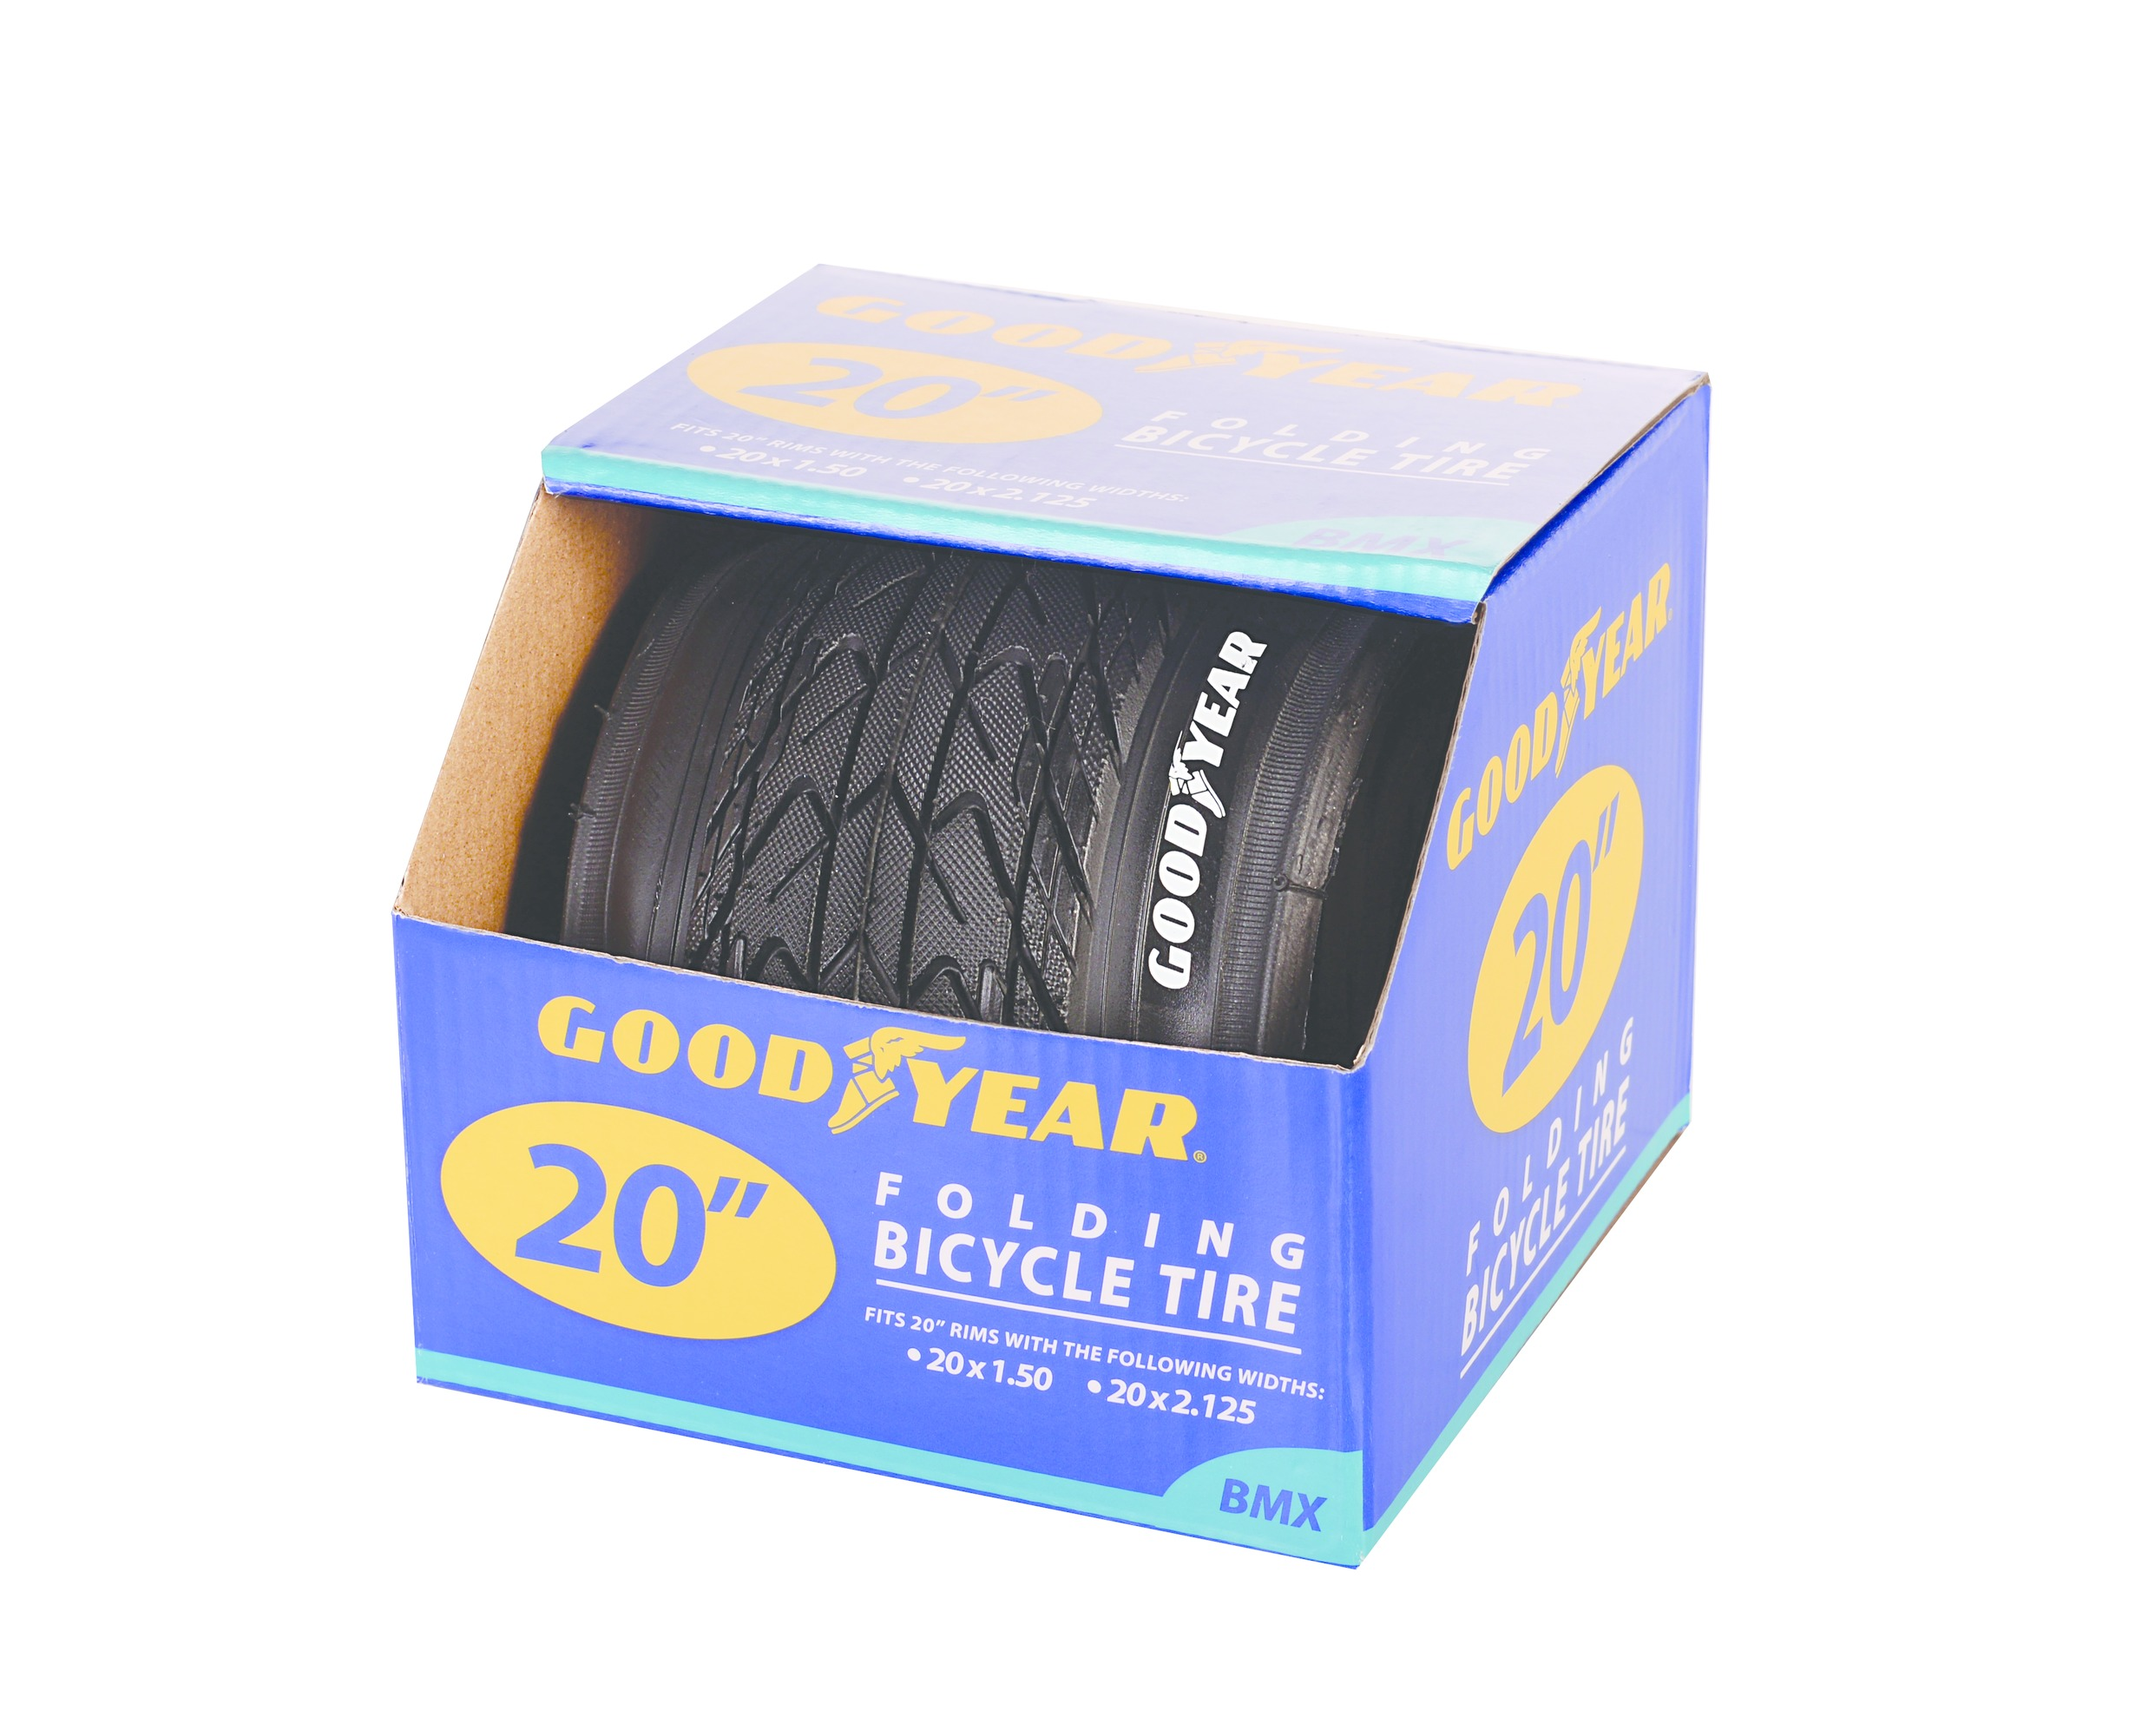 Goodyear 91055 Black BMX Bicycle Tire 20